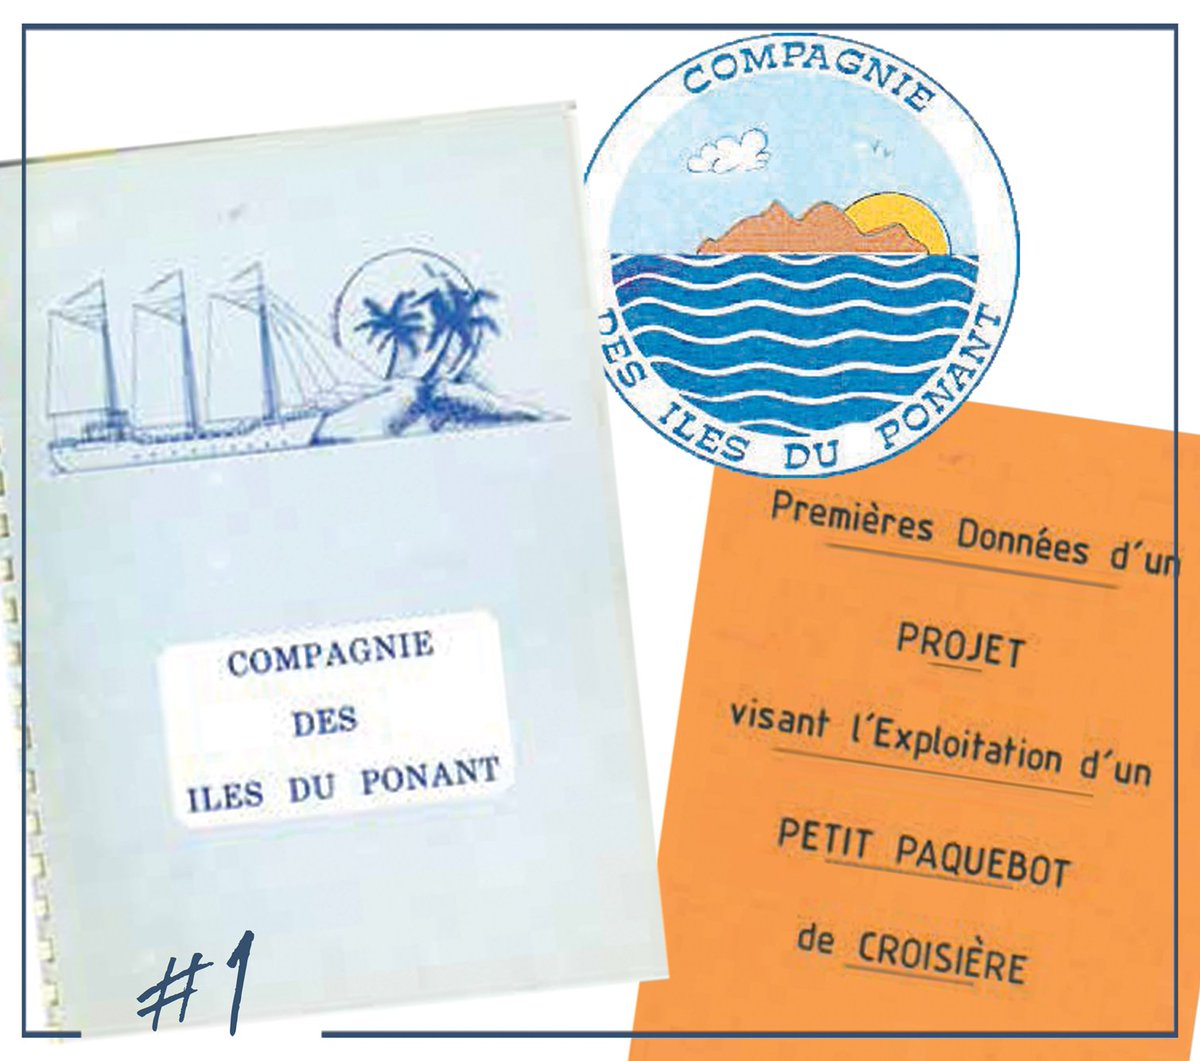 Francois Illas New Tradition: #PONANT30 Hashtag On Twitter